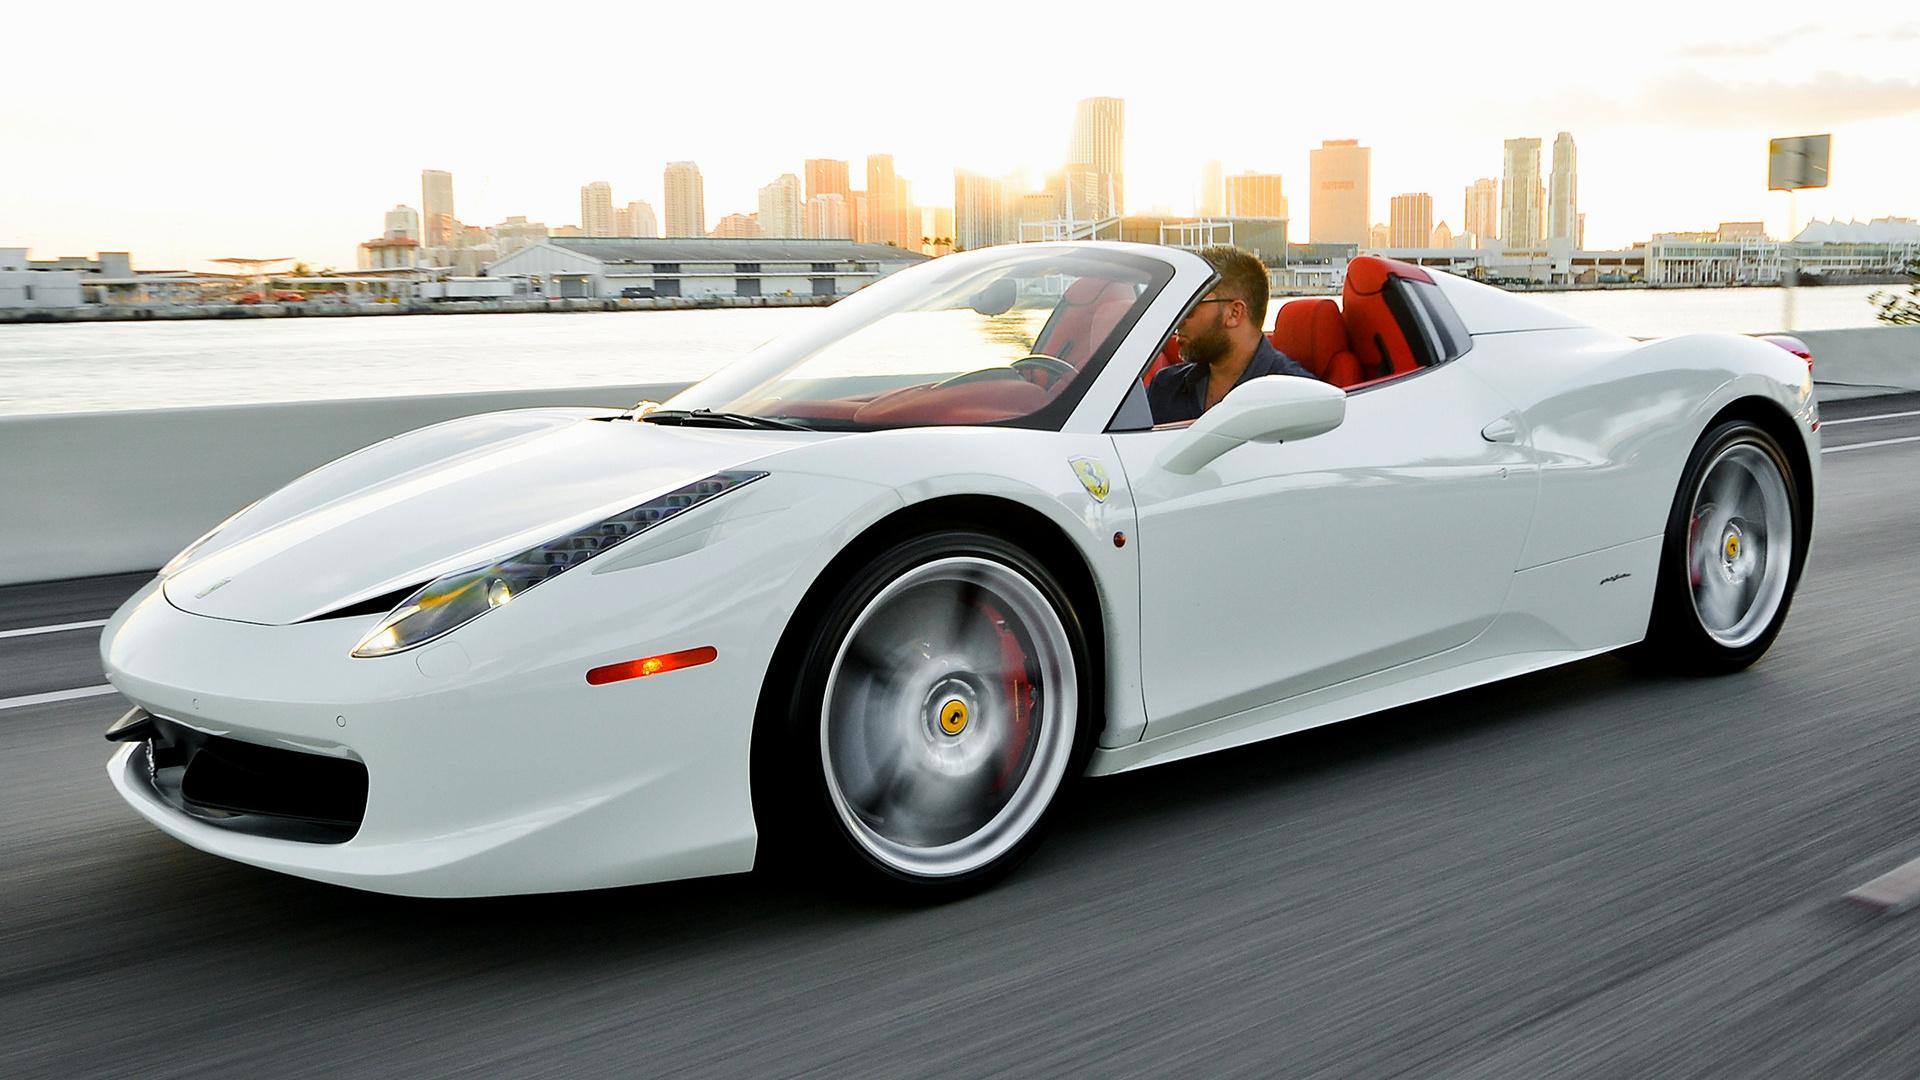 HD 169 Wide 85 Ferrari 458 Spider